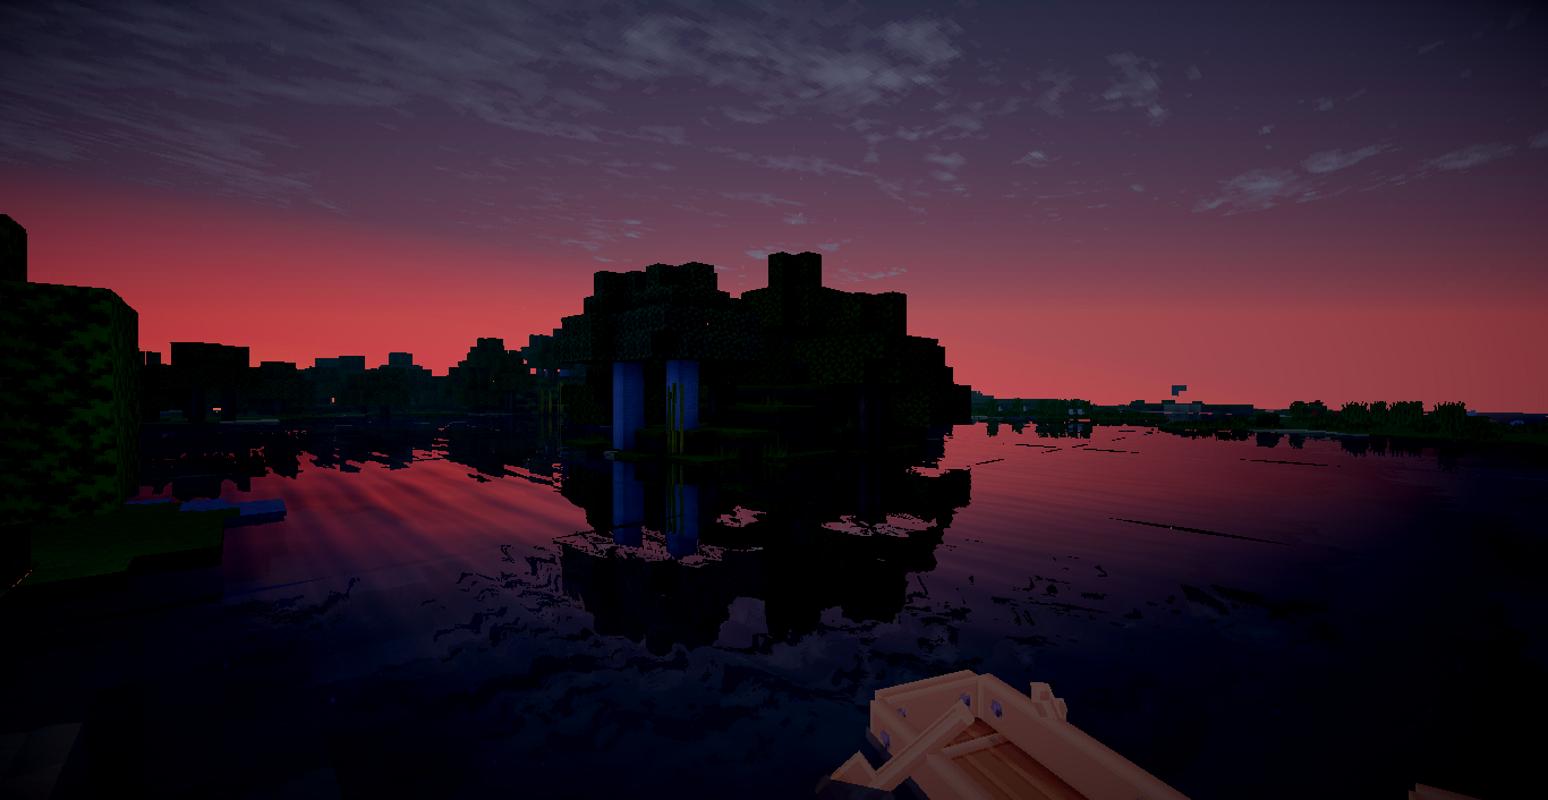 Must see Wallpaper Minecraft Night - Minecraft-sunset-tug-boats-1245983  Pic_74784.jpg